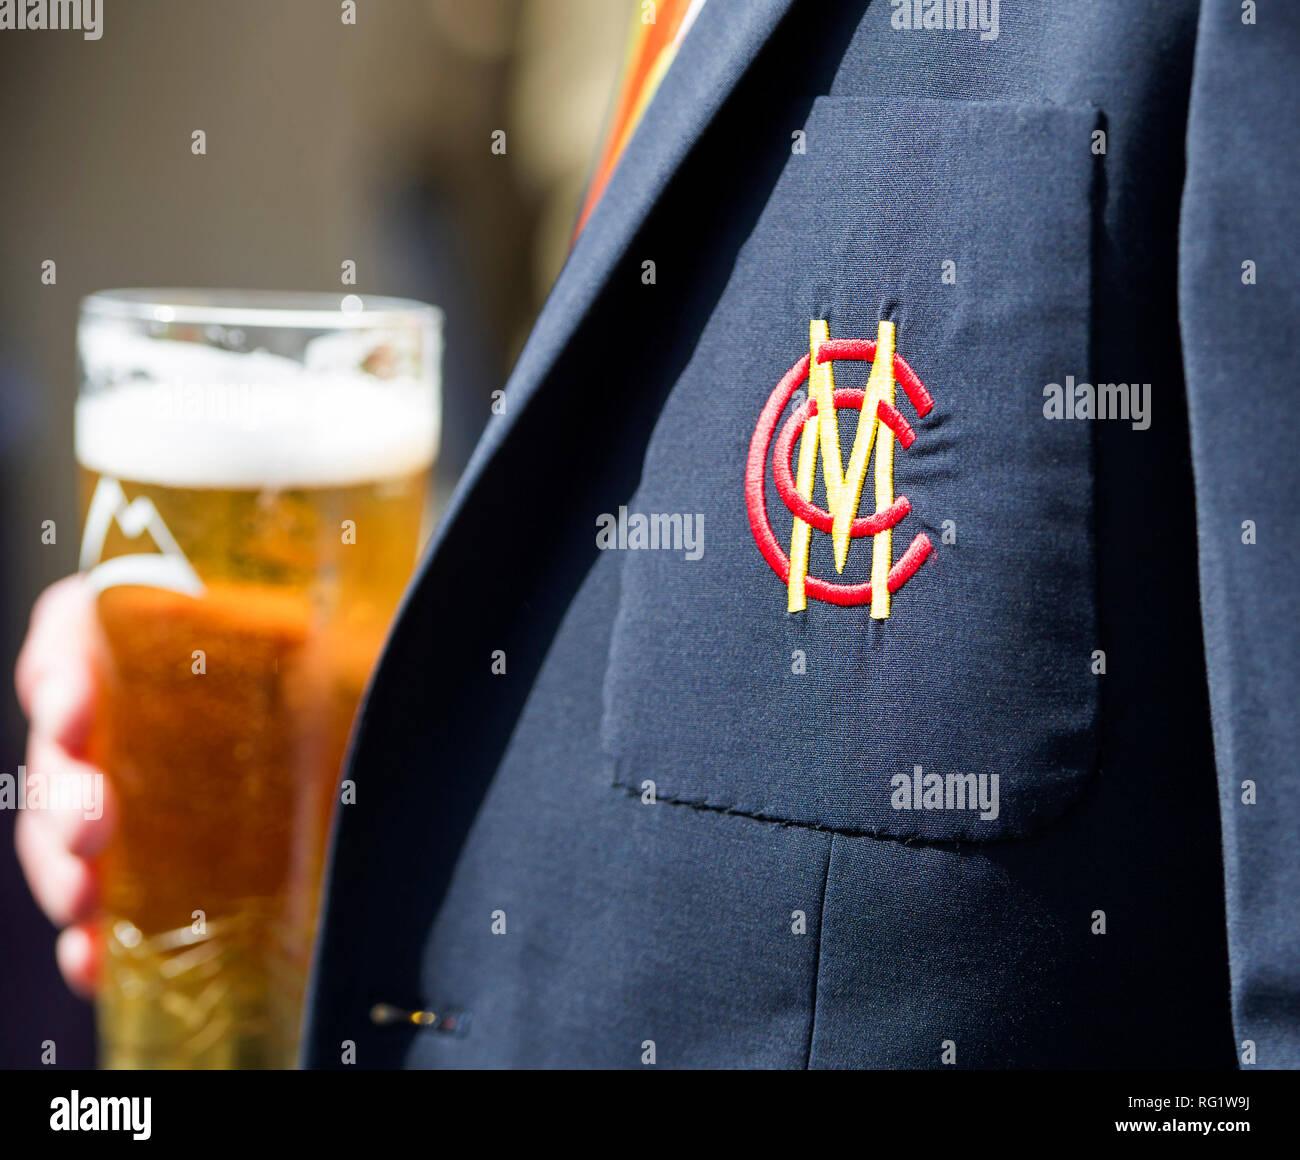 A member of the Marylebone Cricket Club enjoys a beer during the Elie Beach Cricket Festival, Elie Fife,Scotland. - Stock Image